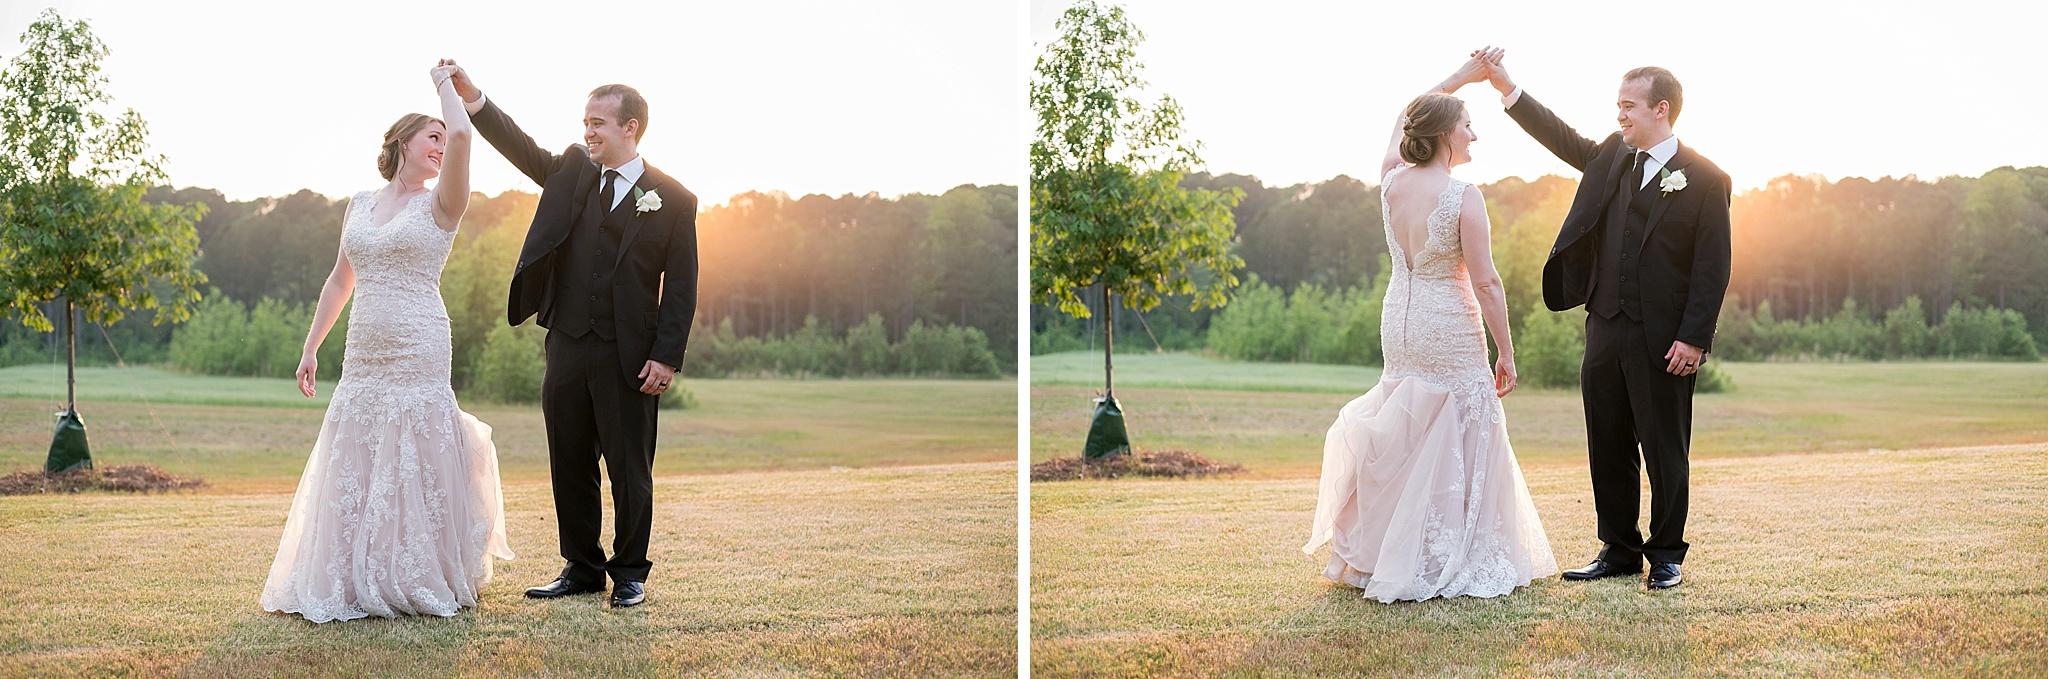 Pavilion-Carriage-Farms-Wedding-Photographer-226.jpg